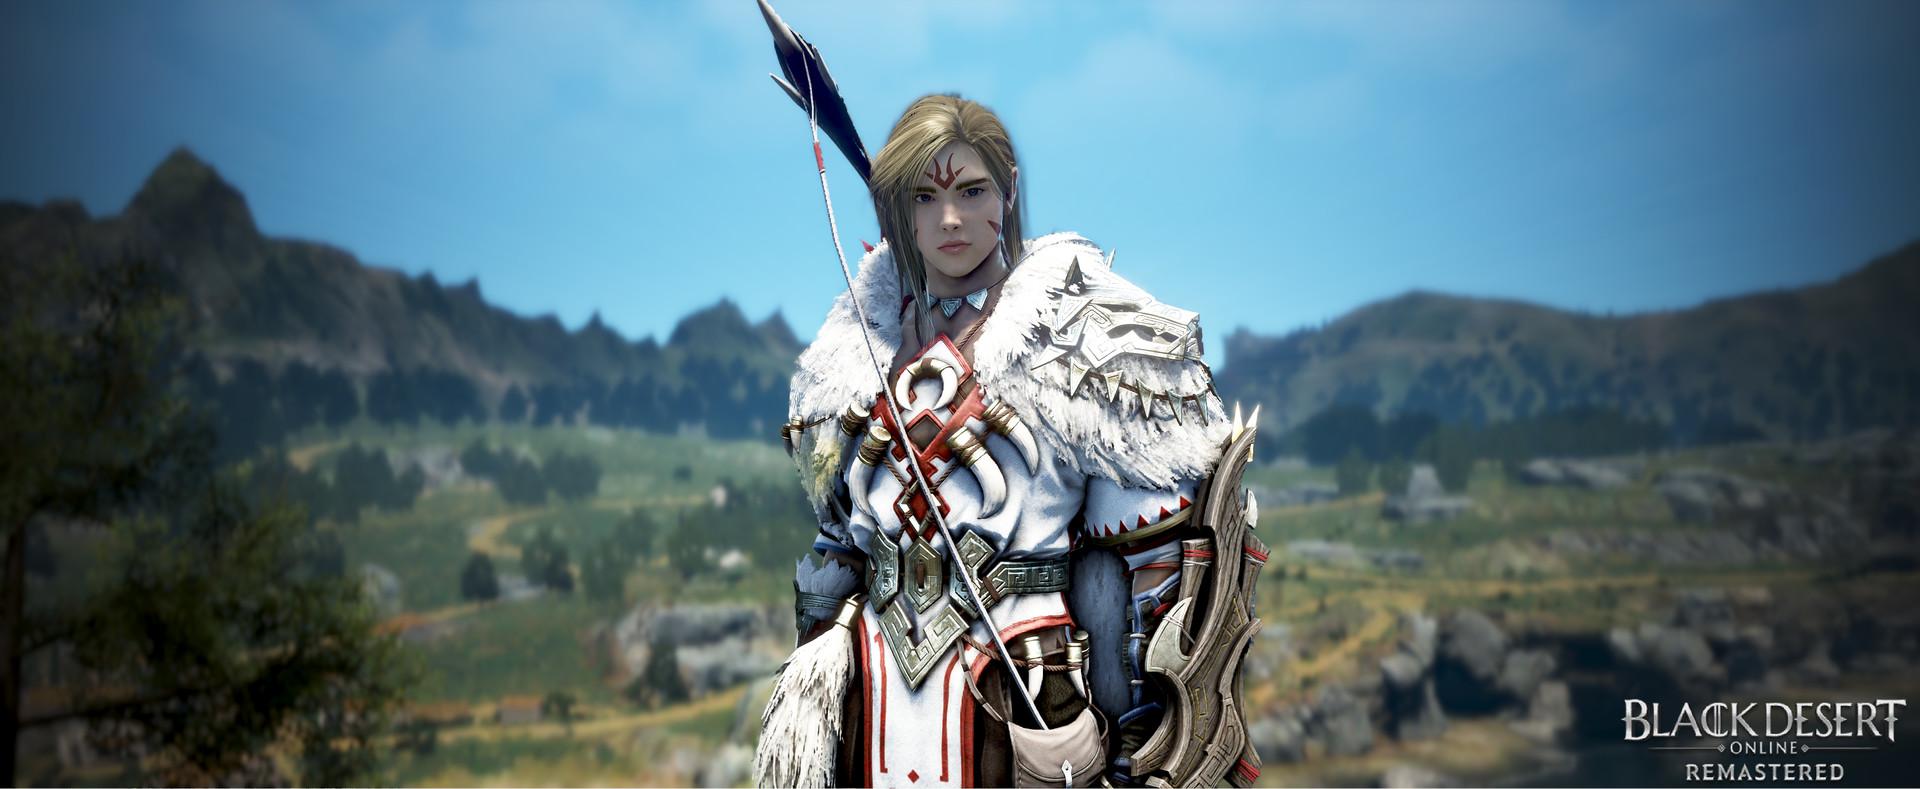 Character from video game, Black Desert Online